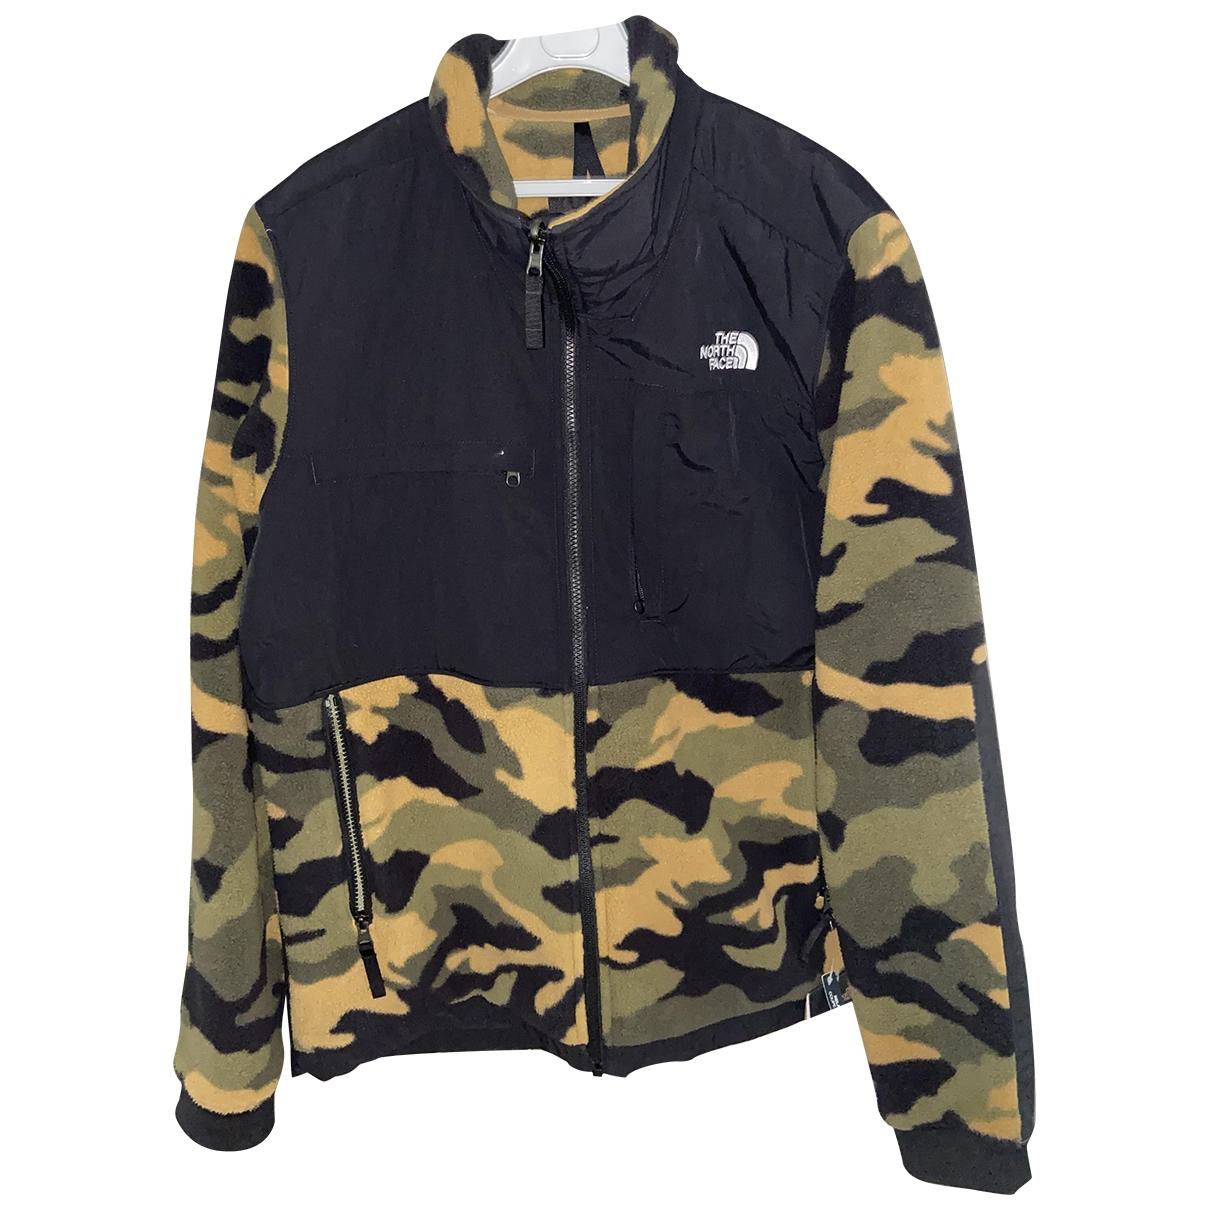 The North Face \N Khaki jacket  for Men M International